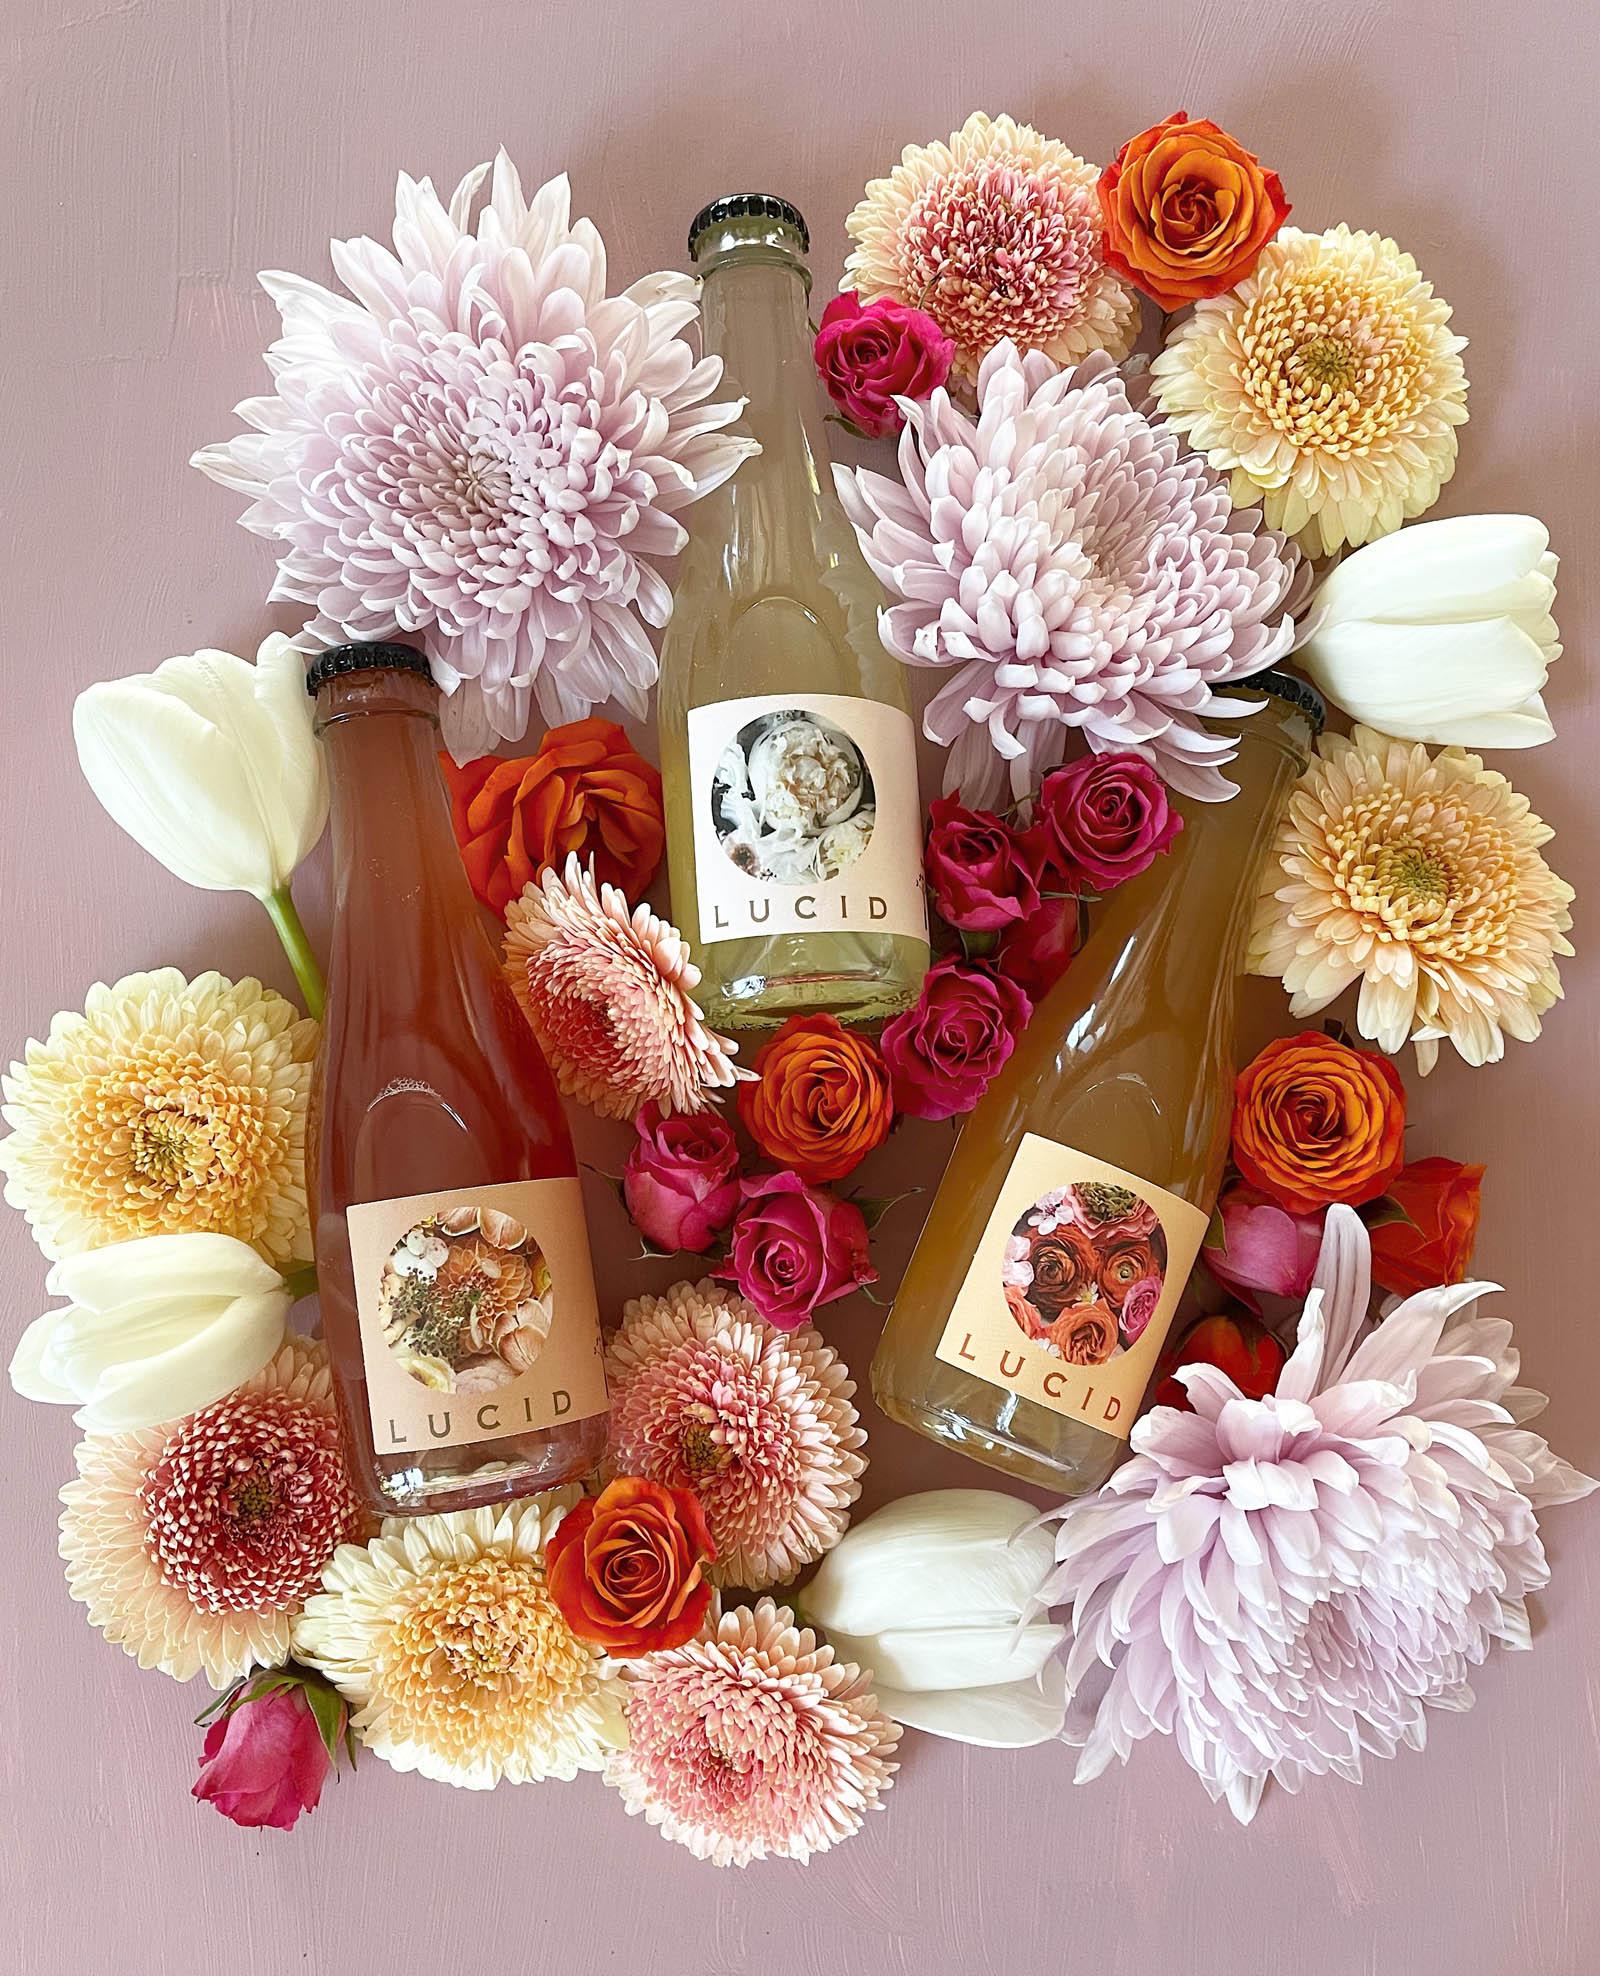 Lucid x Green Wedding Shoes Organic Sparkling Wine Tasting Kit